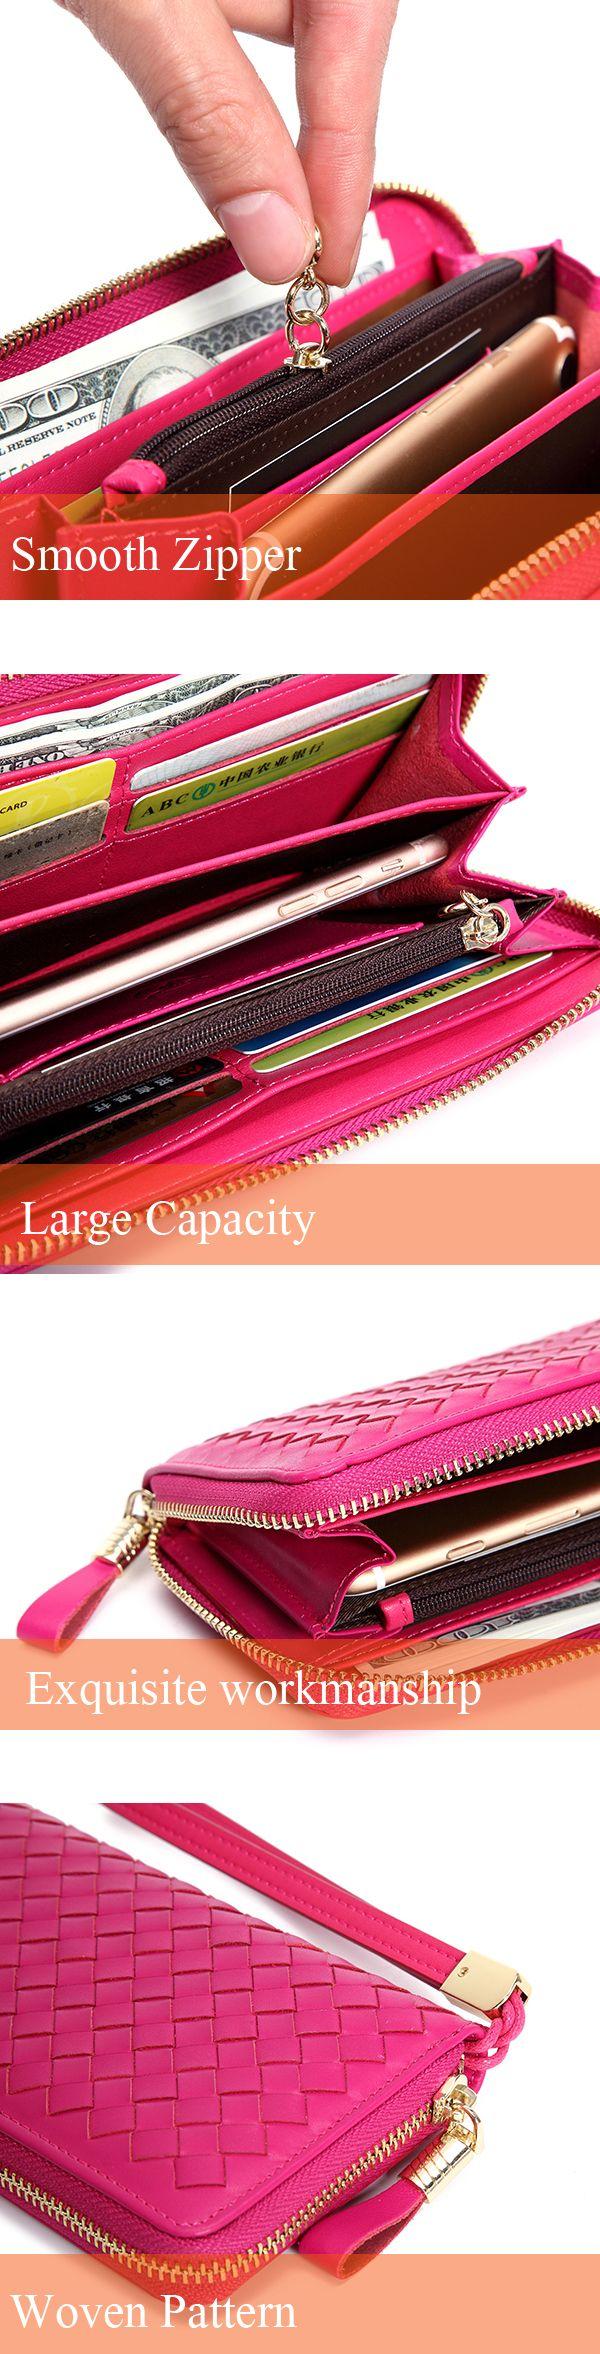 Women Men Genuine Leather Woven Pattern 8 Card Slots Cellphone Wallet Coins Bag Wallet